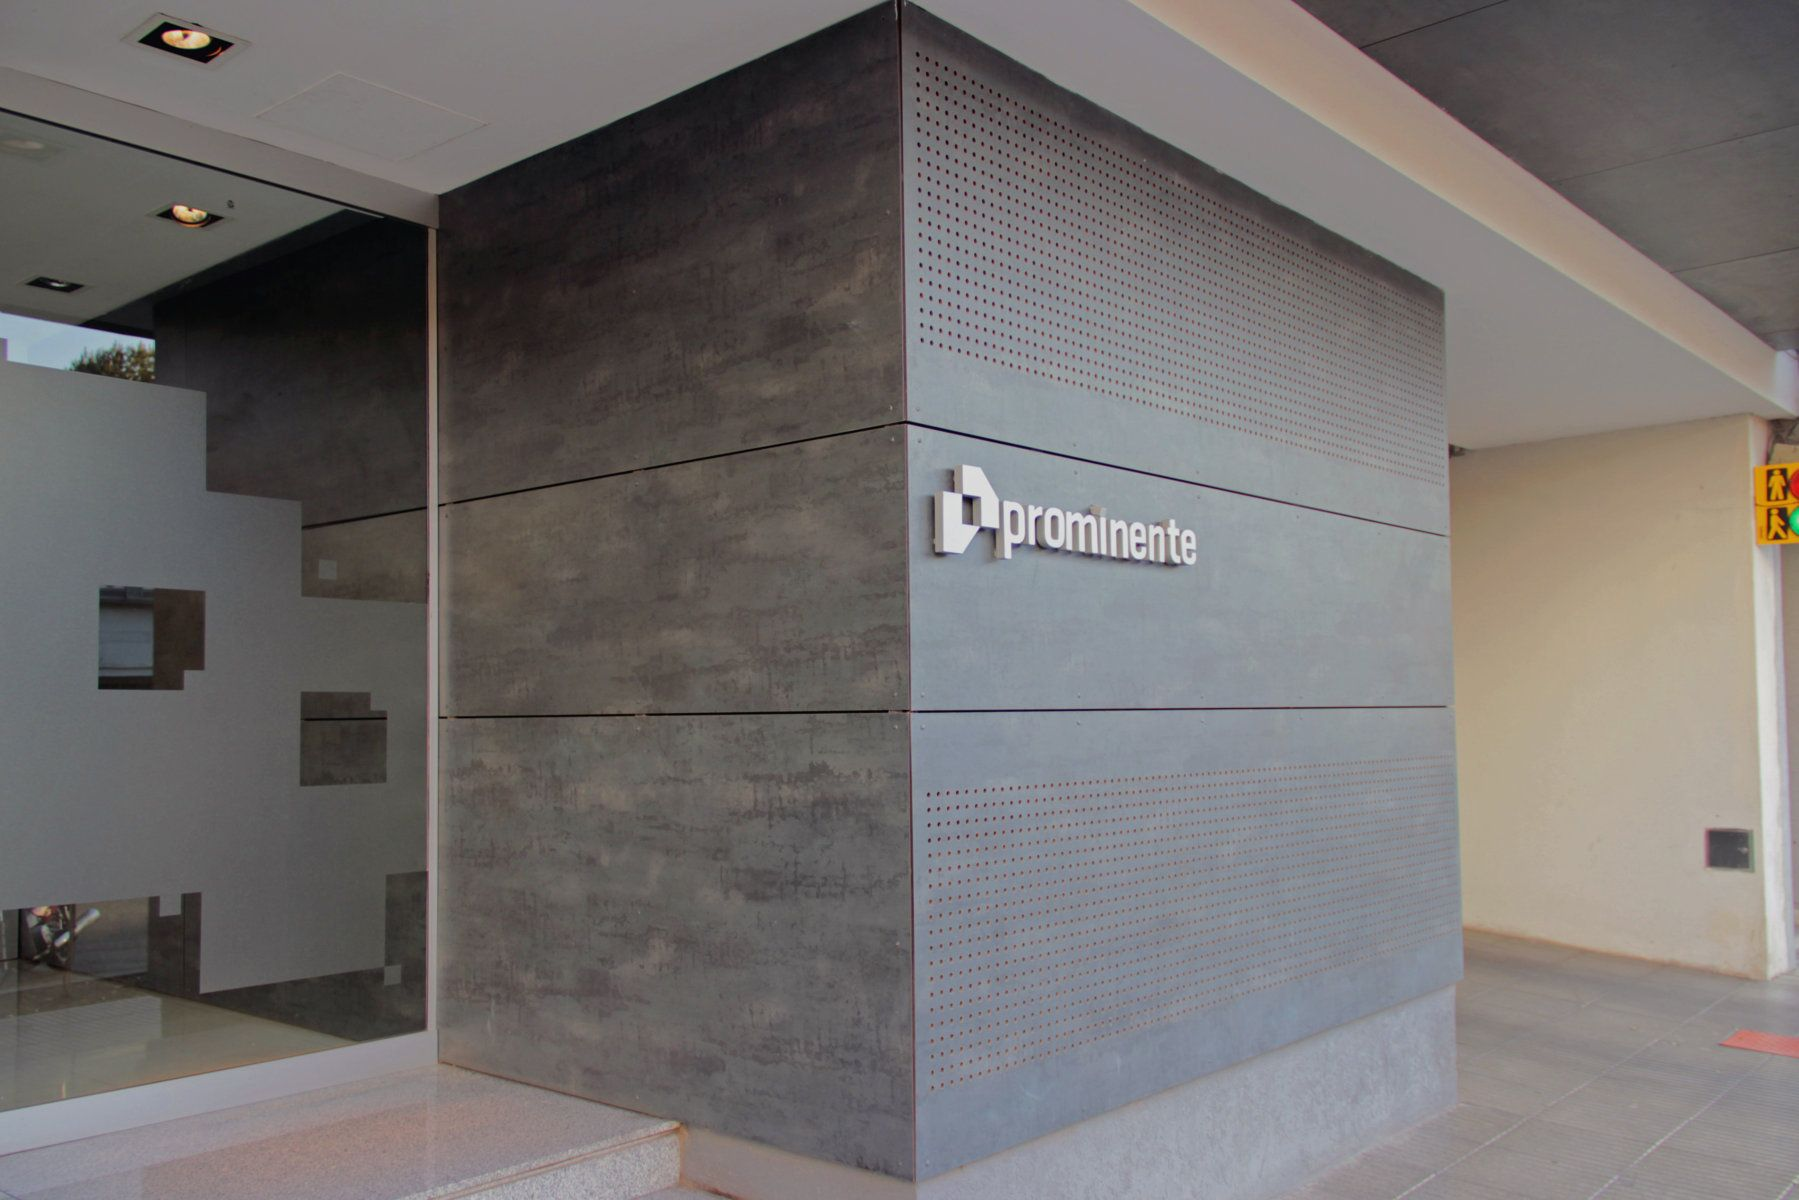 Material de fachada platten exterior parasoles - Material para fachadas ...